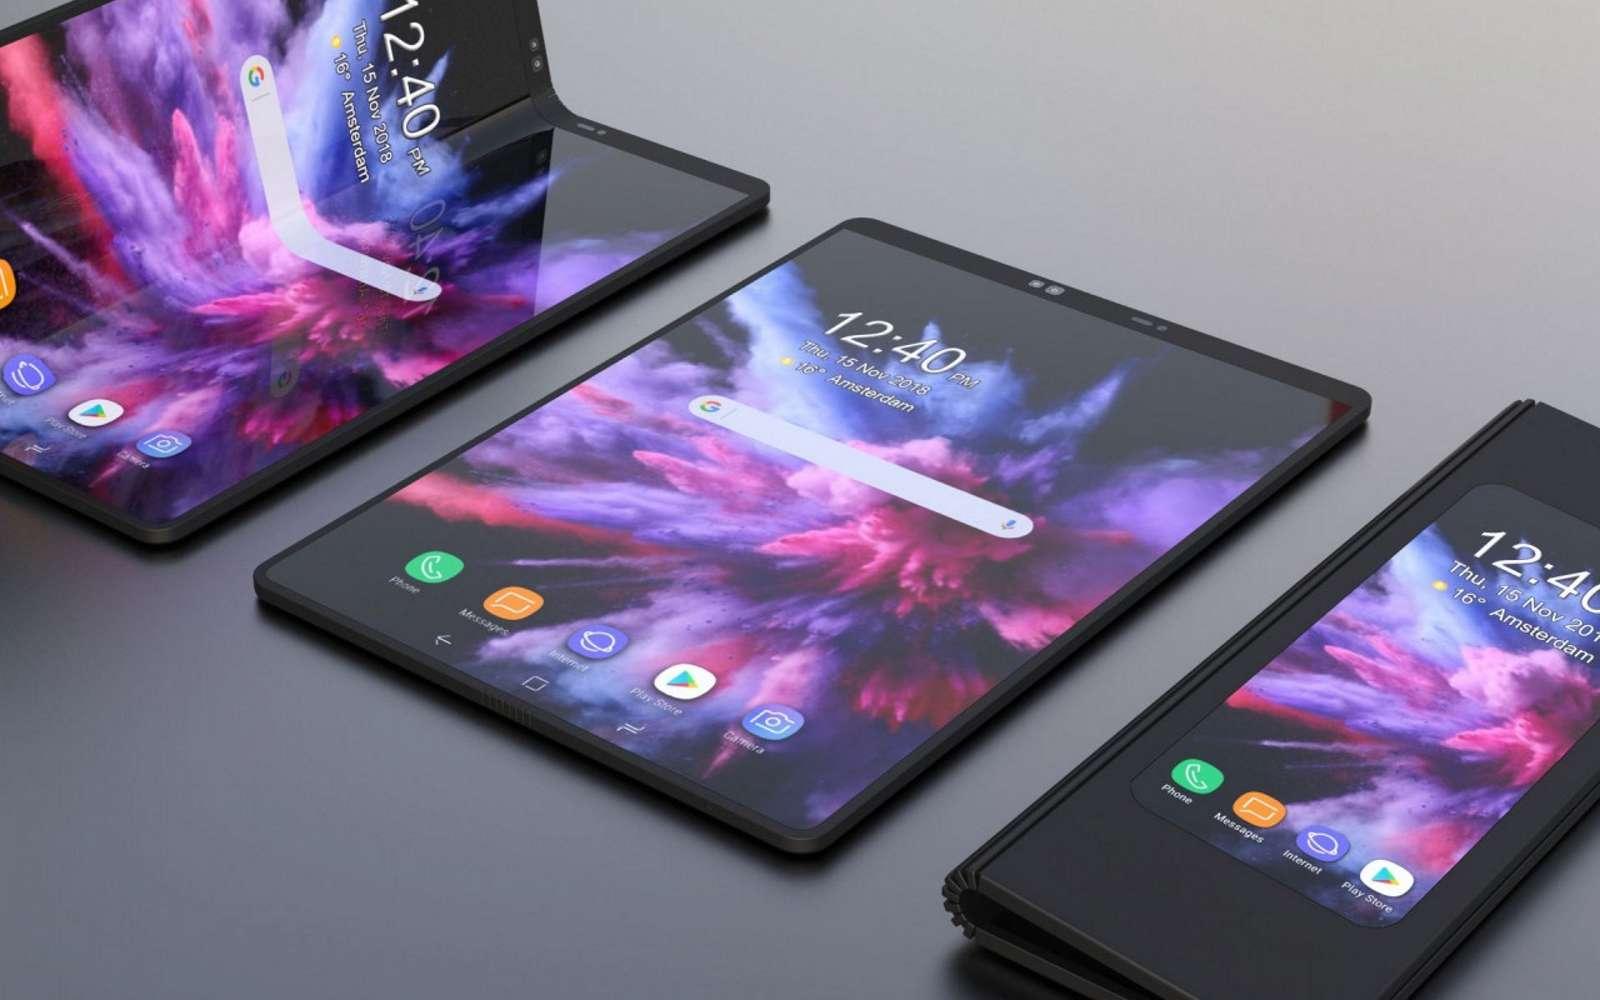 Le Samsung Galaxy Fold se vend très bien au Ghana